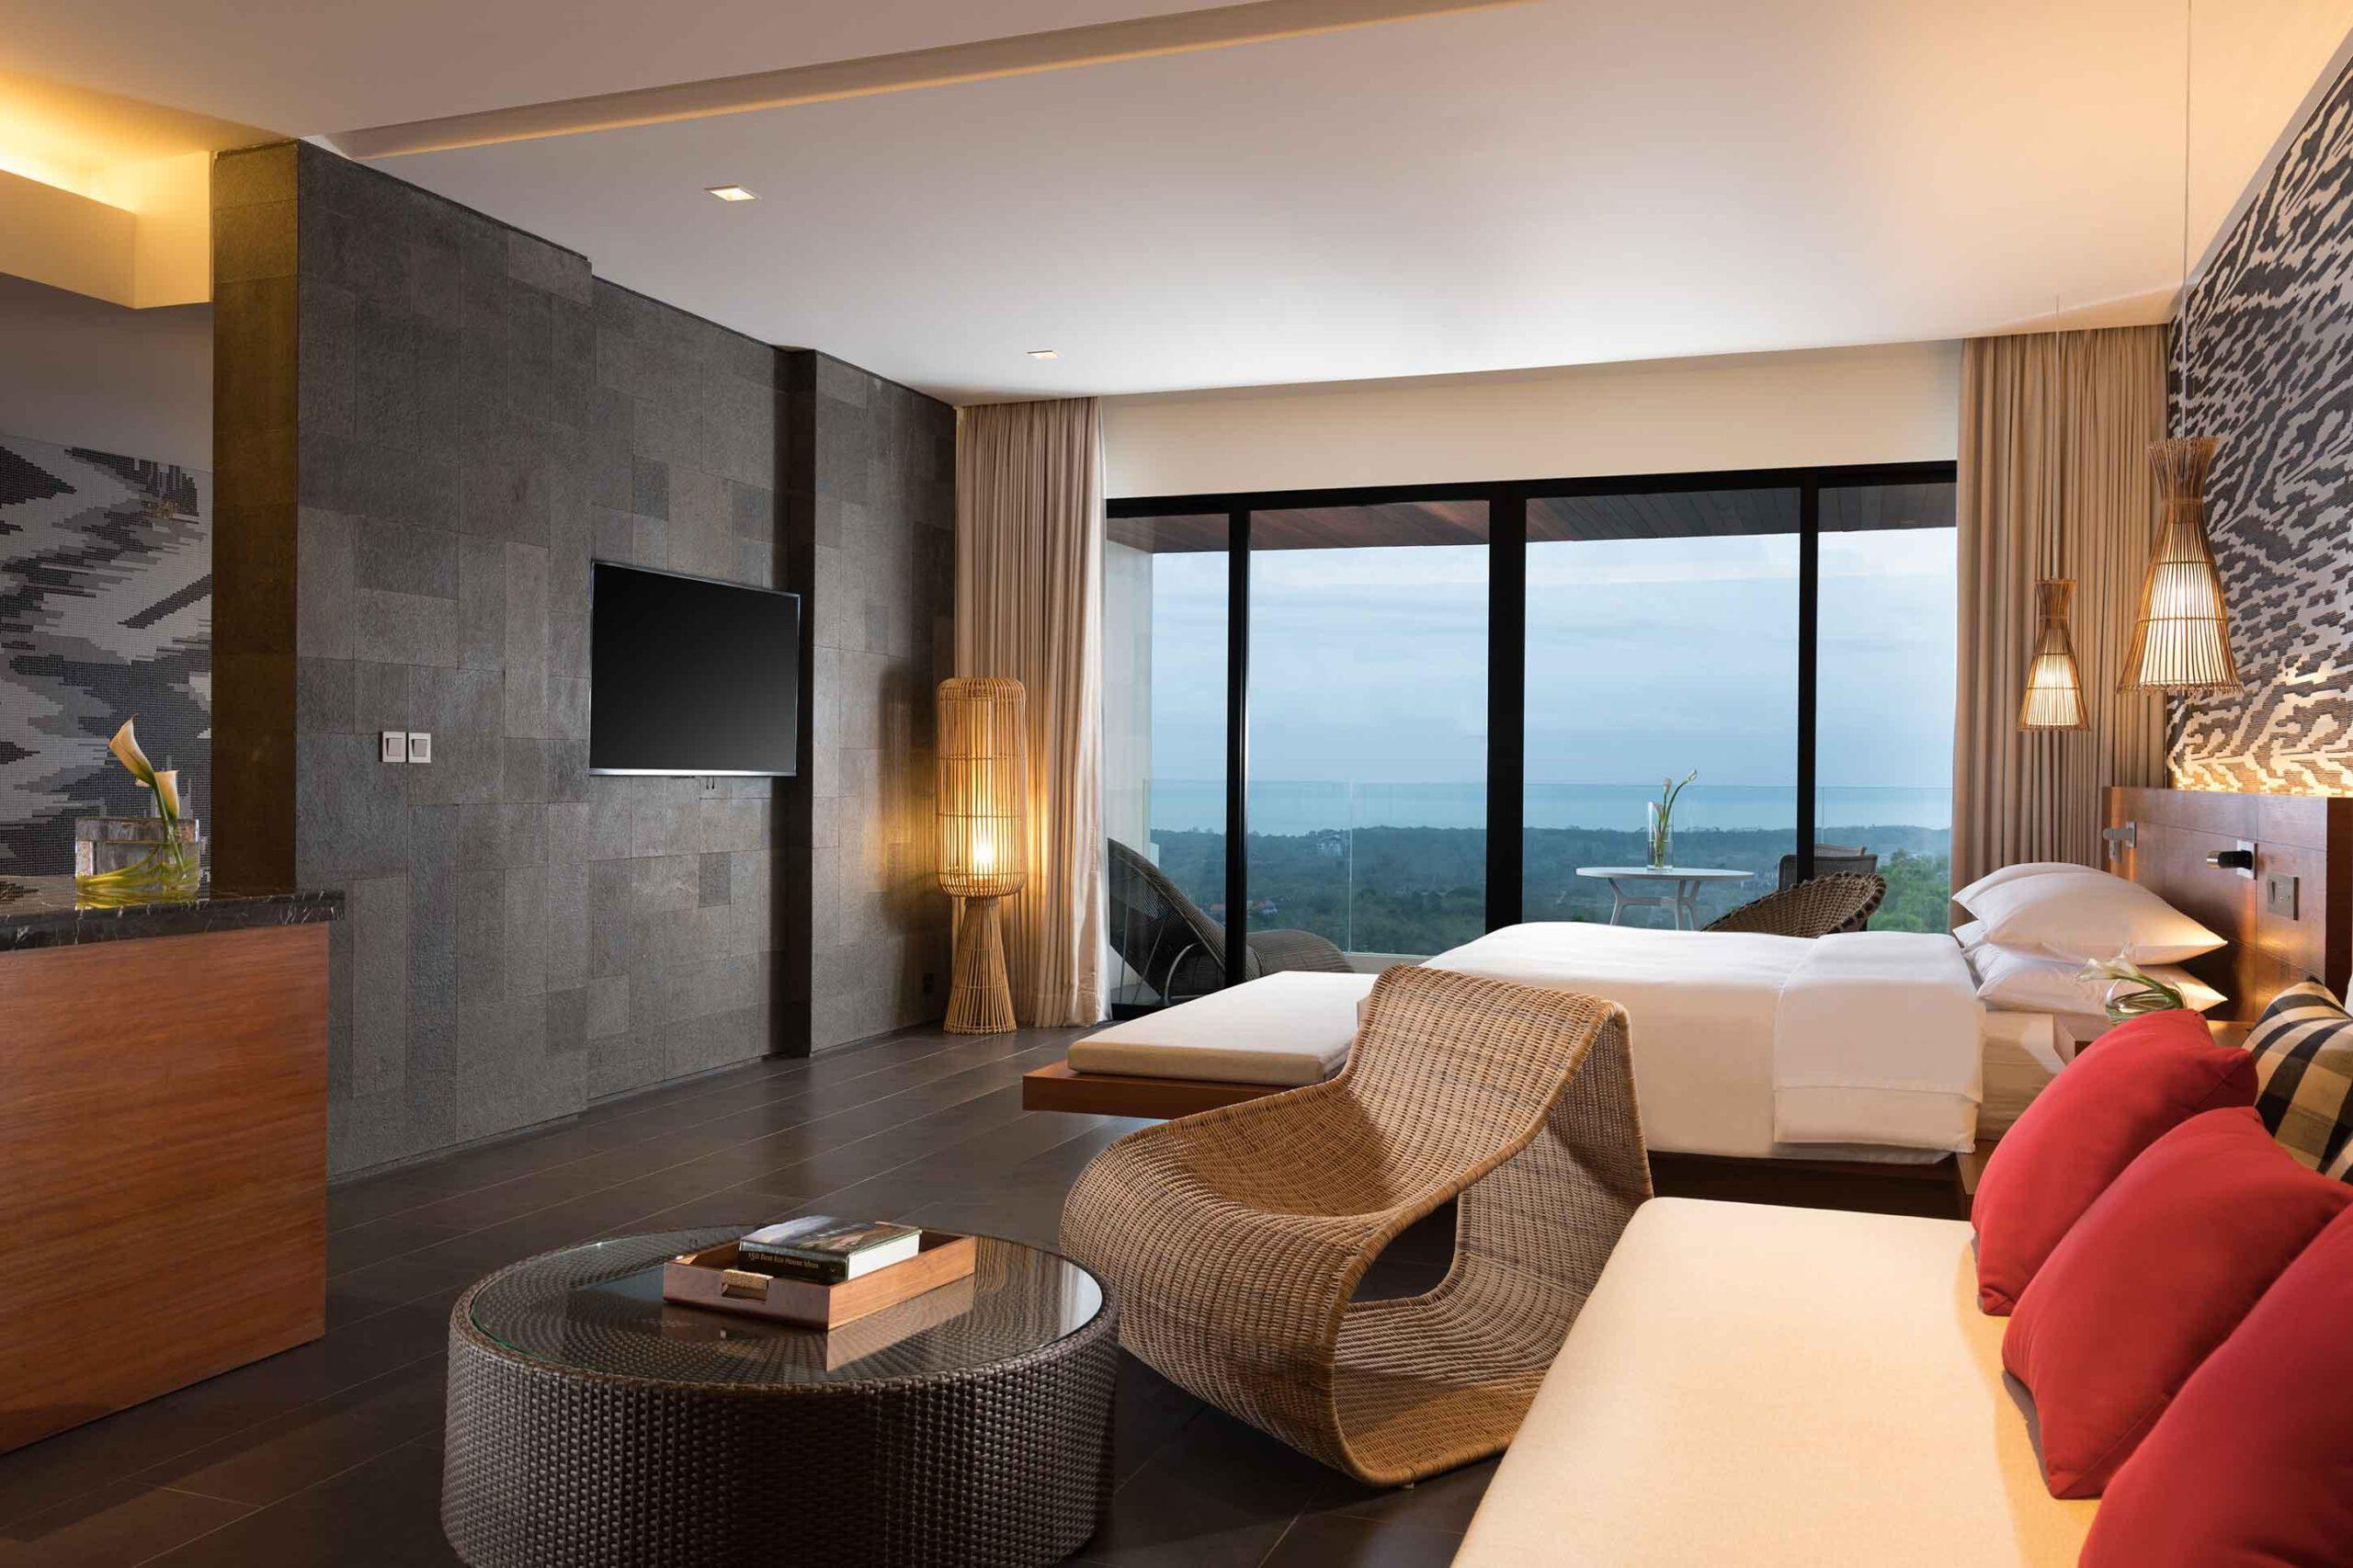 https://www.otdesign.com/wp-content/uploads/2021/04/renaissance-bali-uluwatu-resort-spa-photo4-scaled.jpg